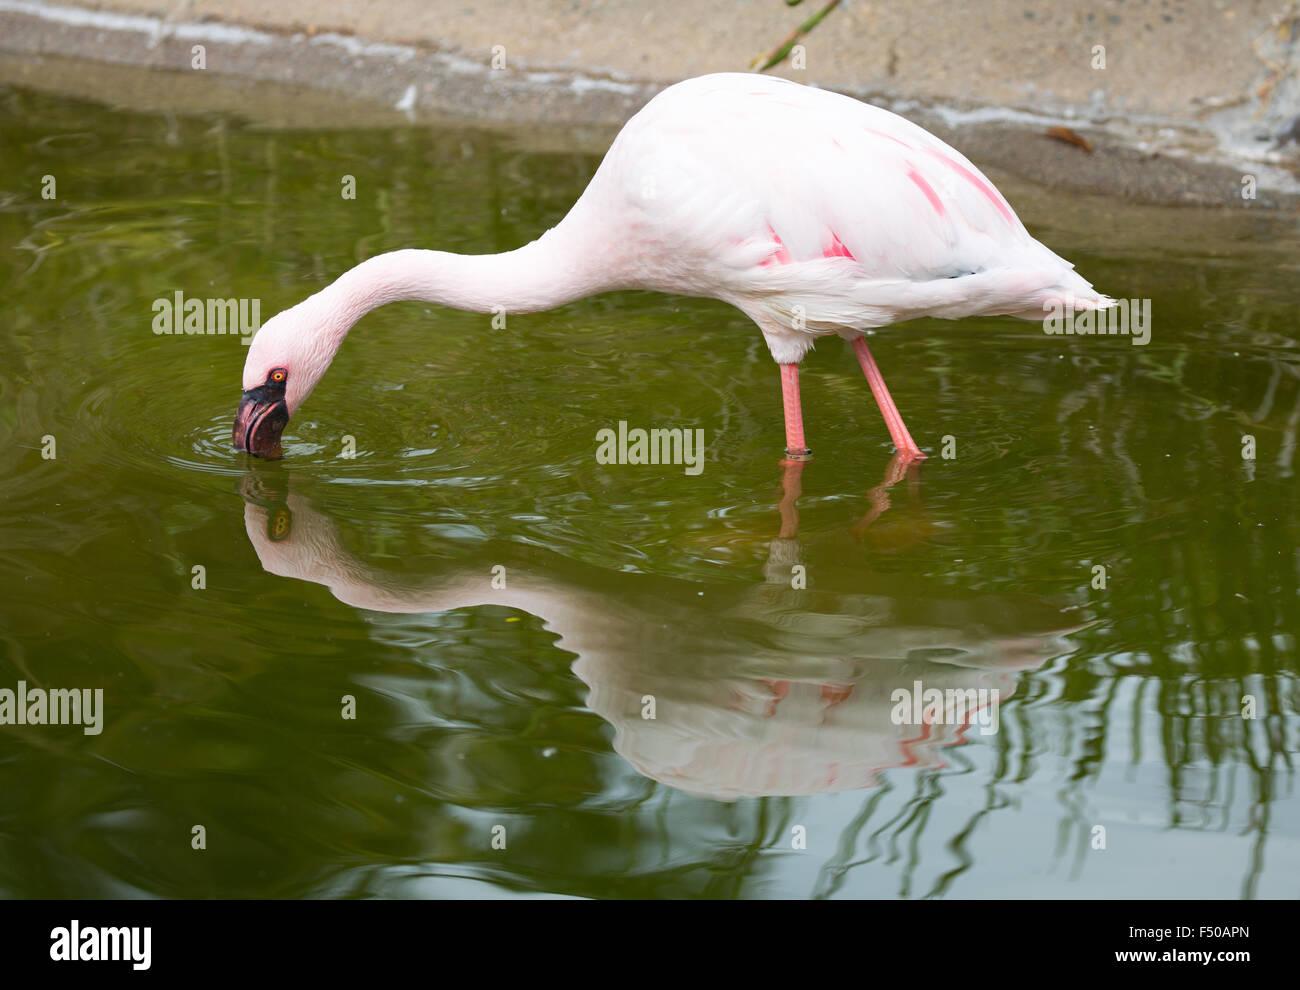 Lesser Flamingo (Phoeniconaias minor) adult filter feeding. - Stock Image